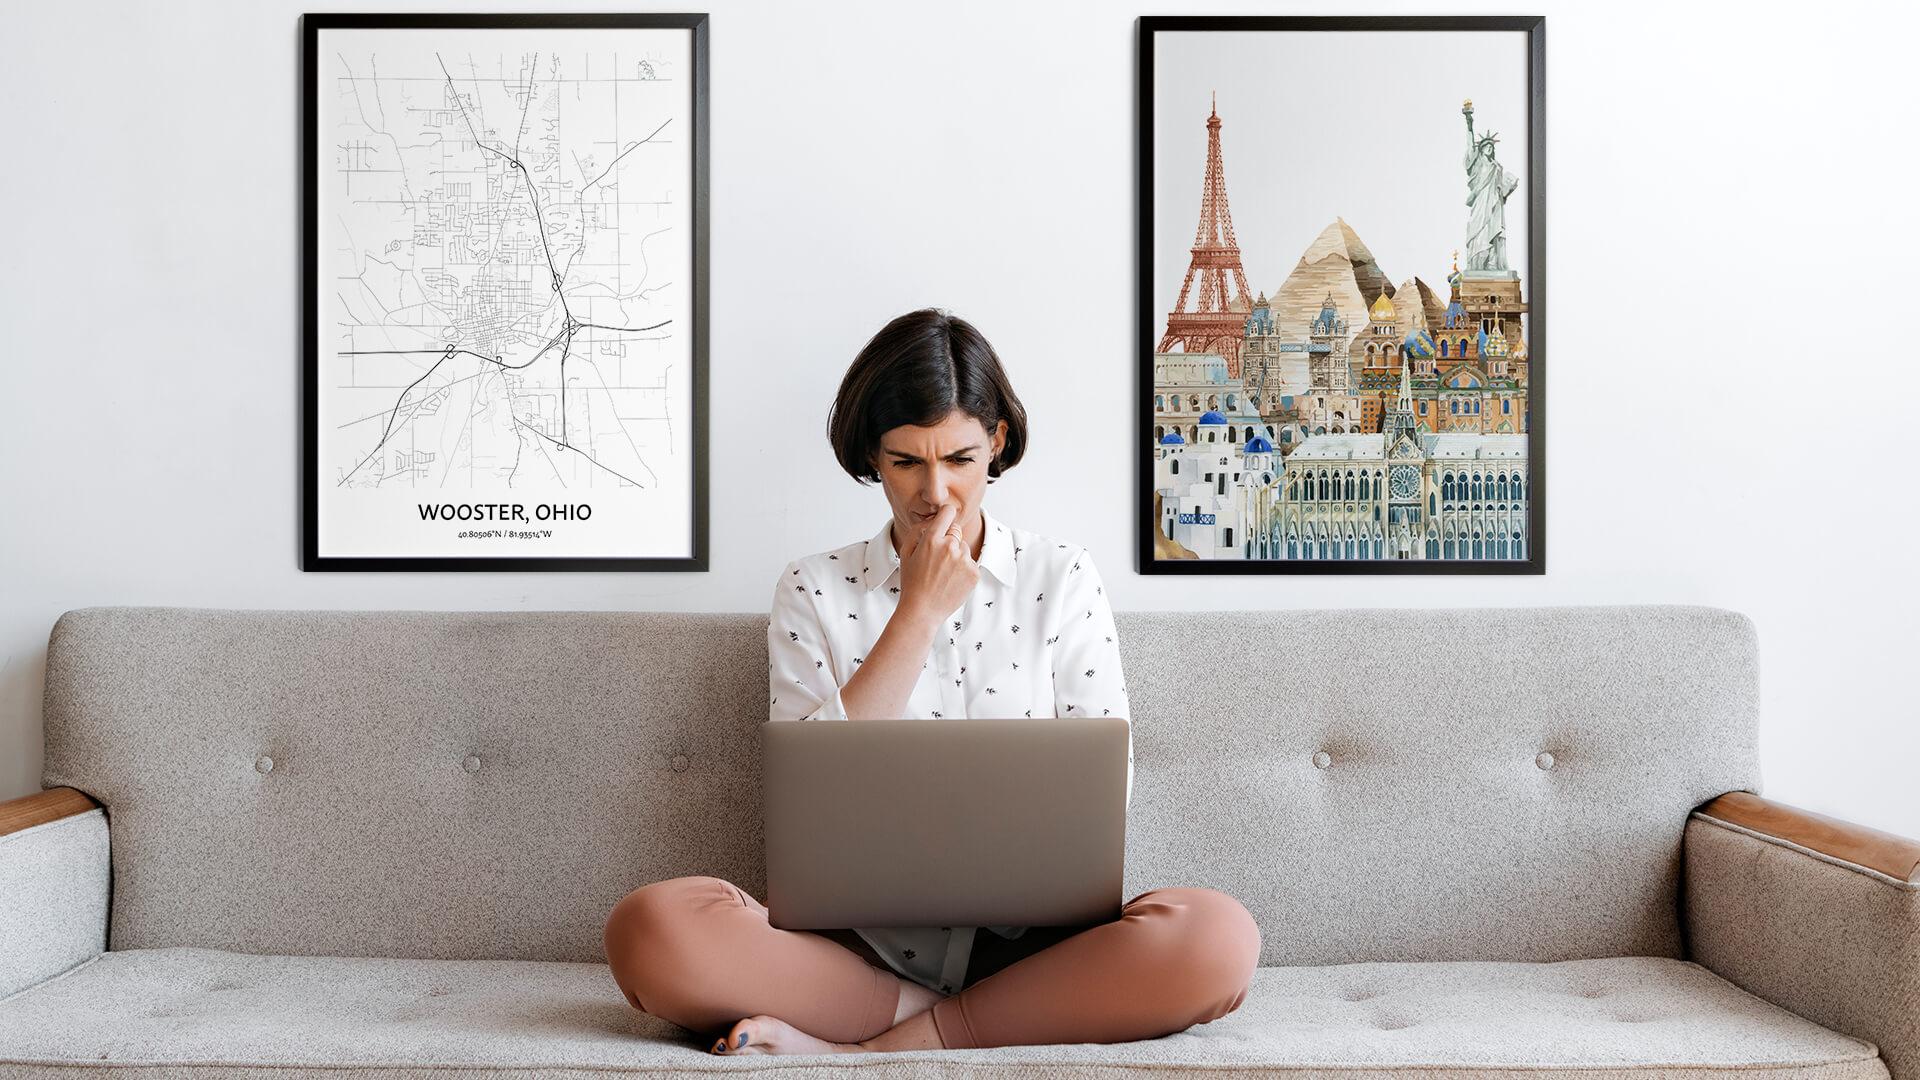 Wooster city map art